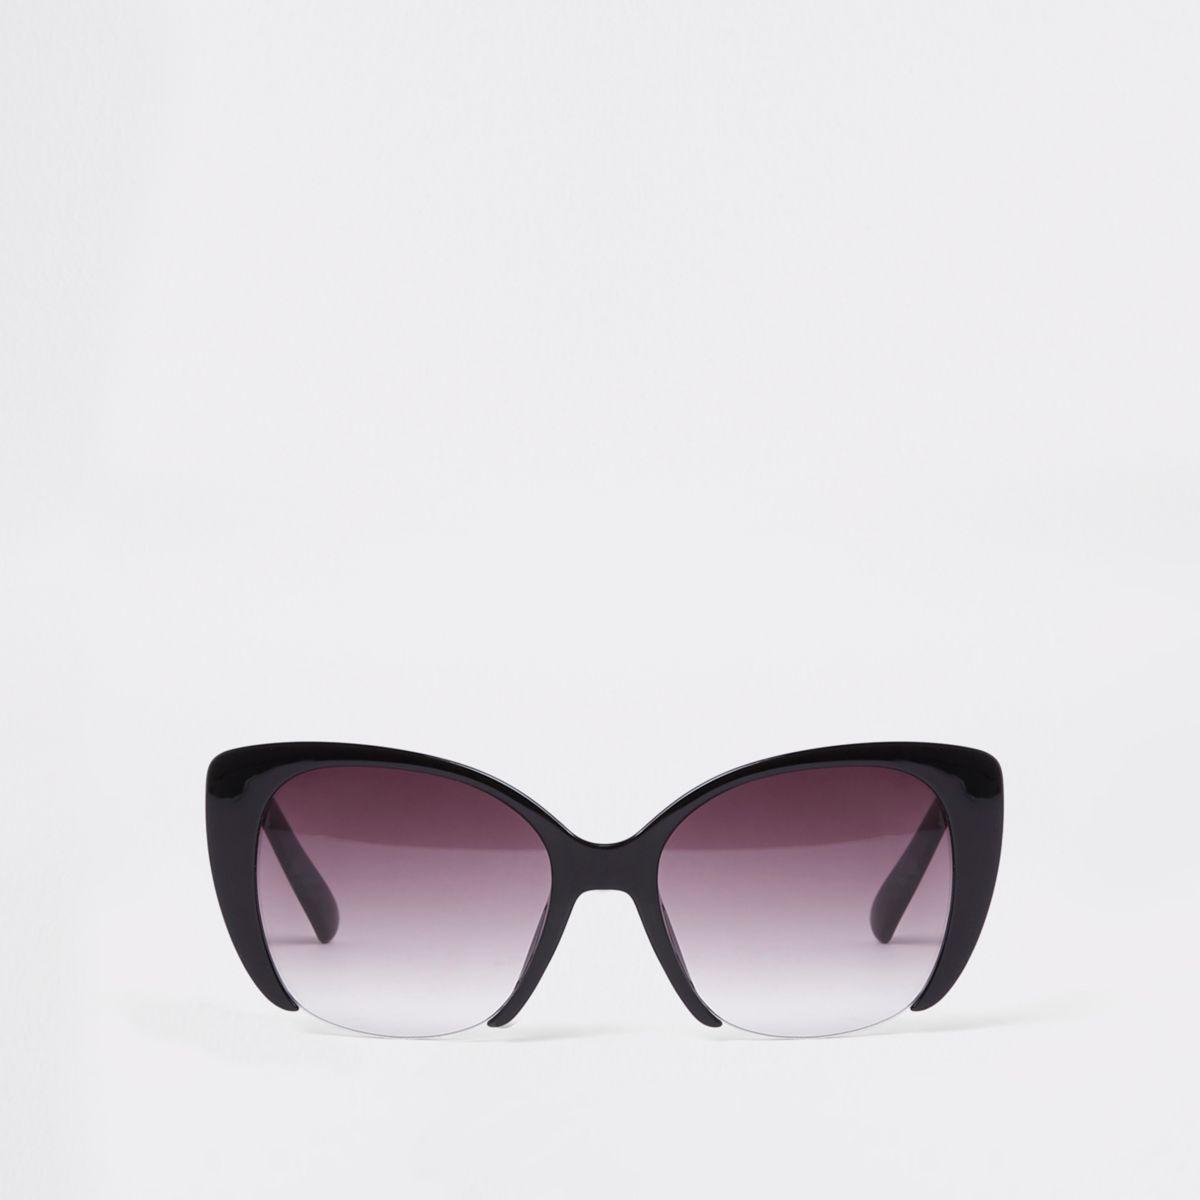 Black cut out lens glam sunglasses